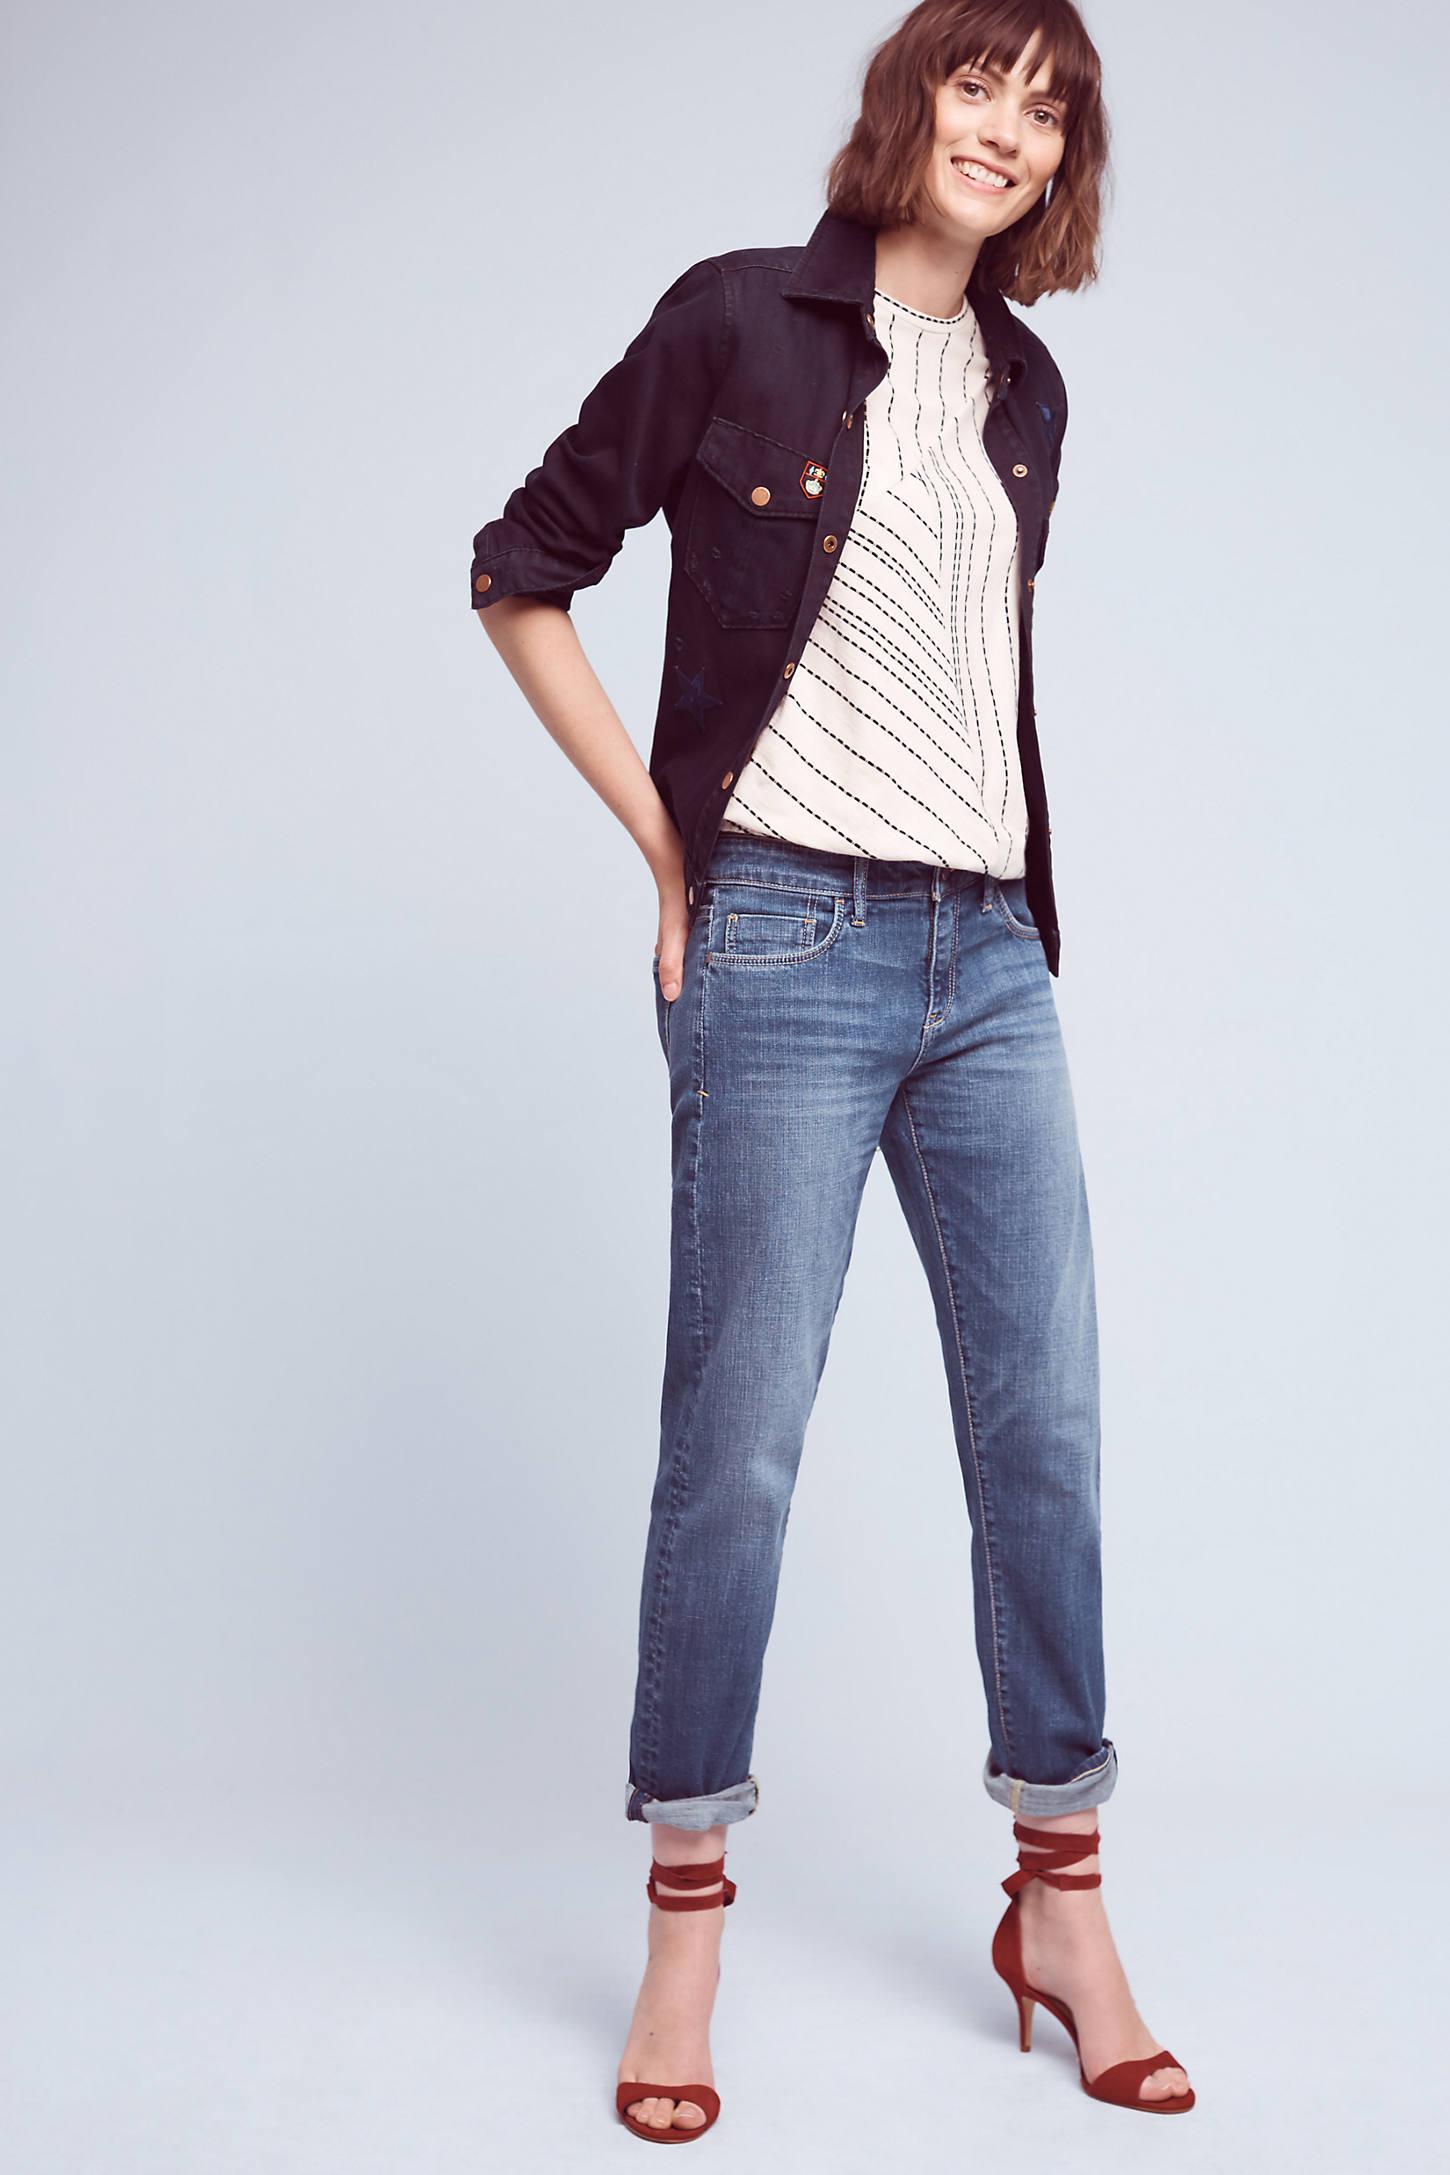 Pilcro Hyphen Mid-Rise Belaxed Boyfriend Jeans